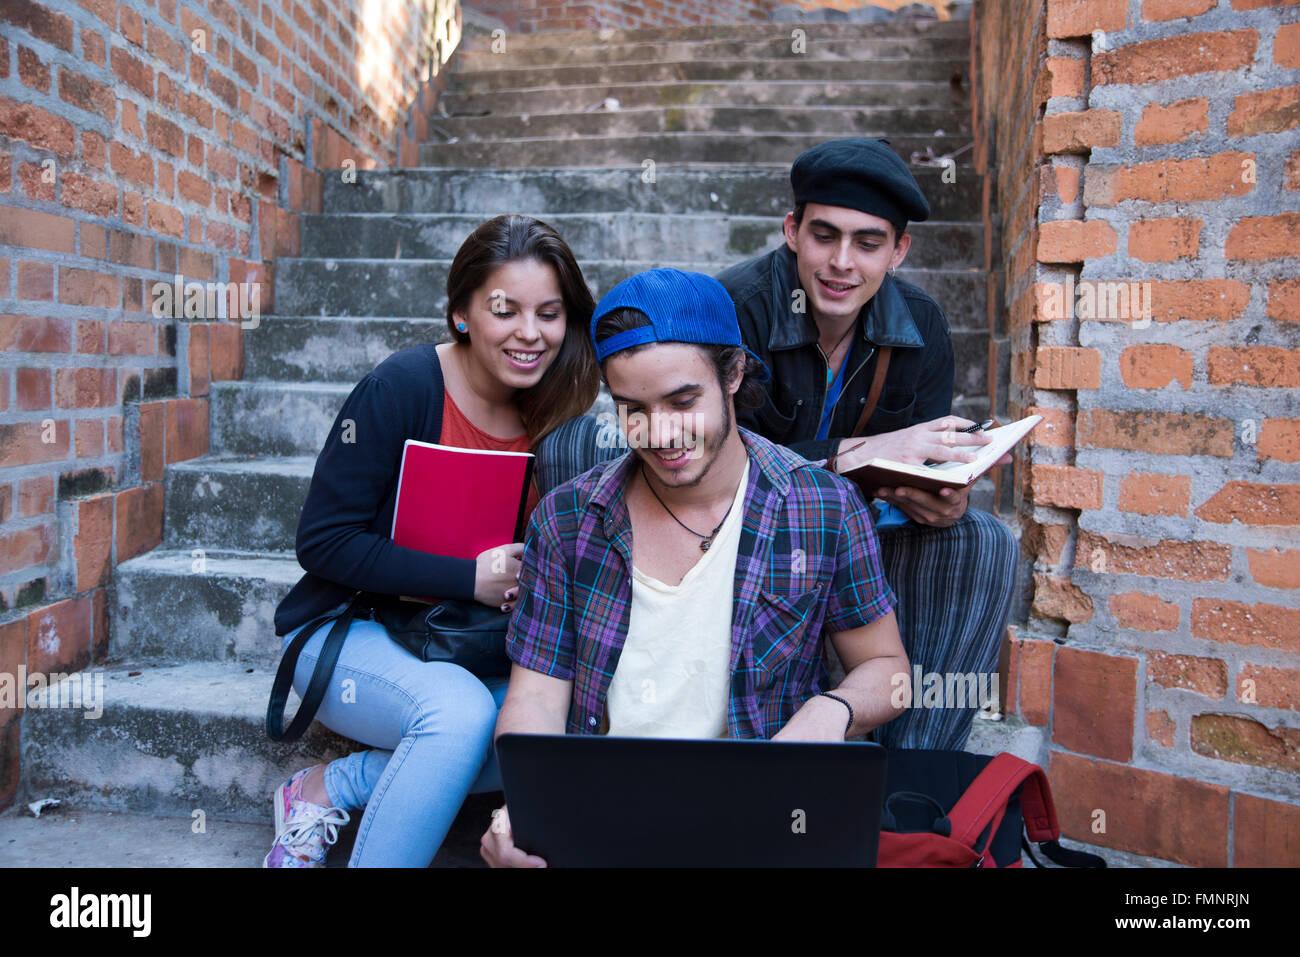 Three college students - Stock Image